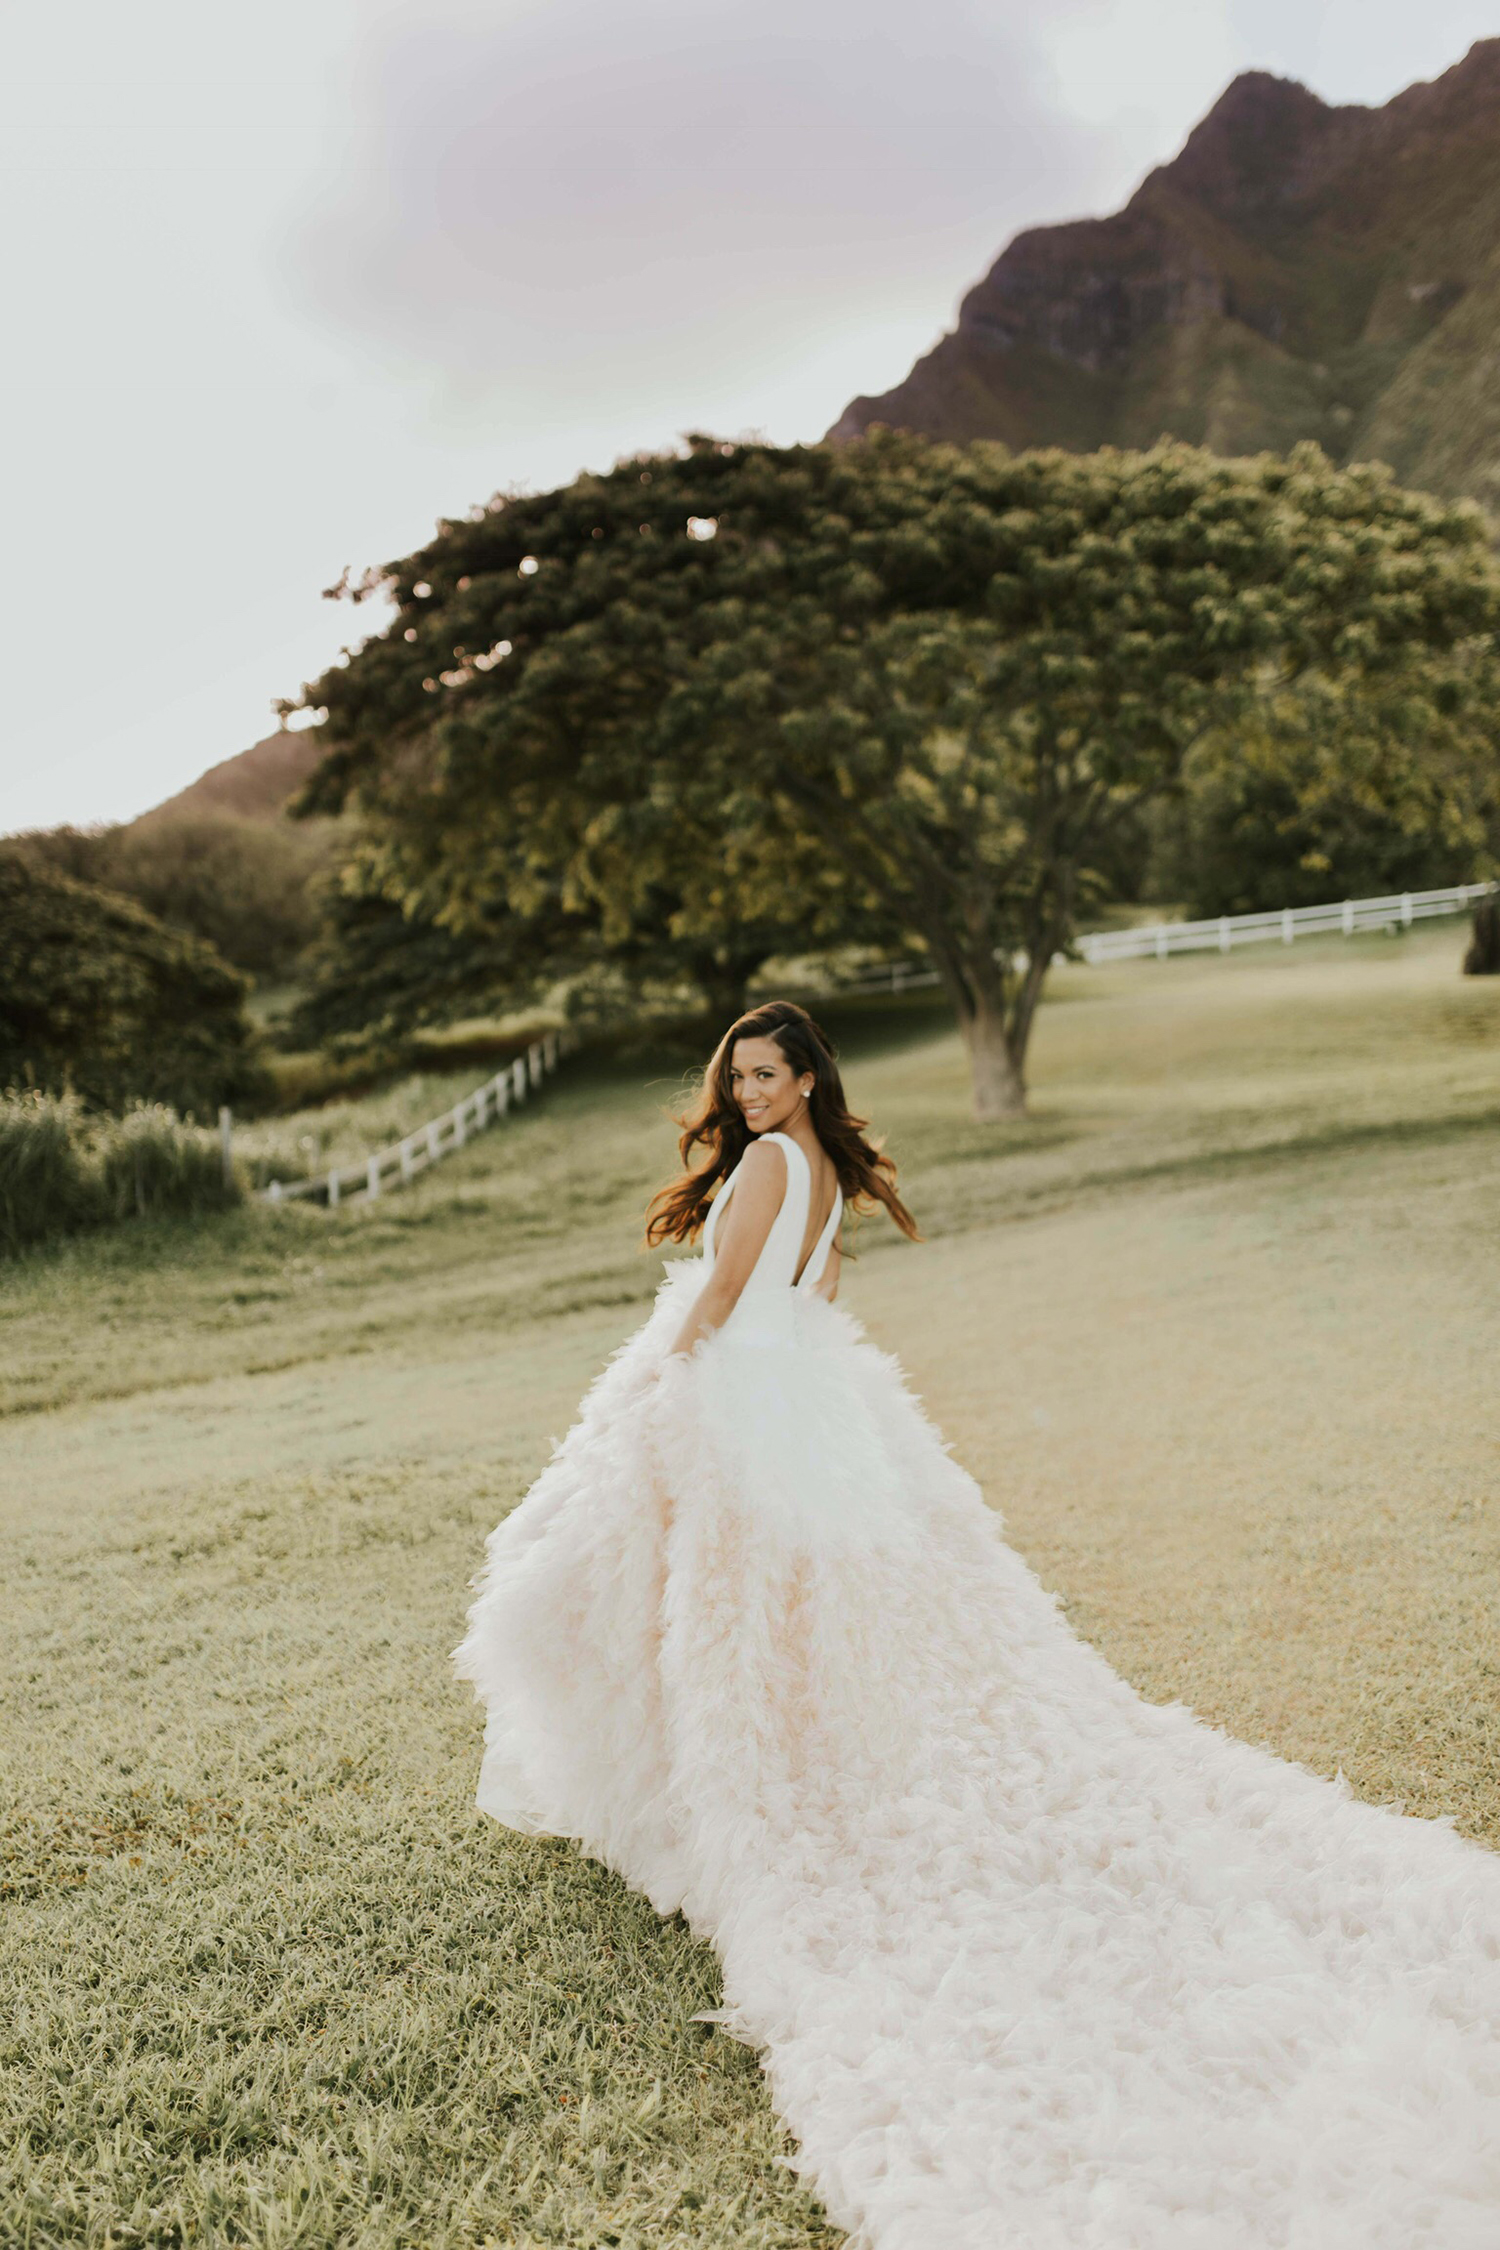 Jessi Malay Pronovias Bridal 2018